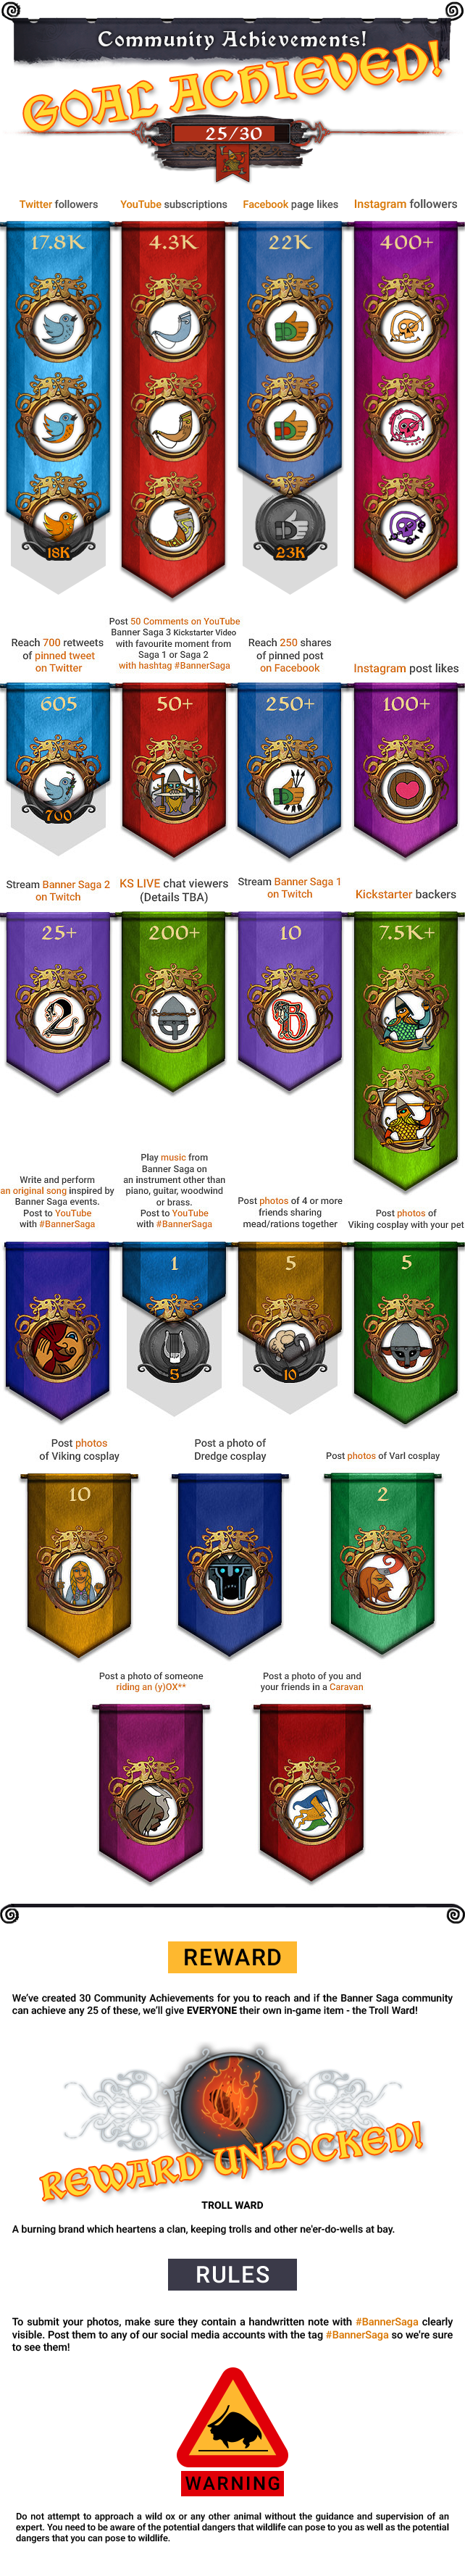 Banner Saga 3 by Stoic — Kickstarter